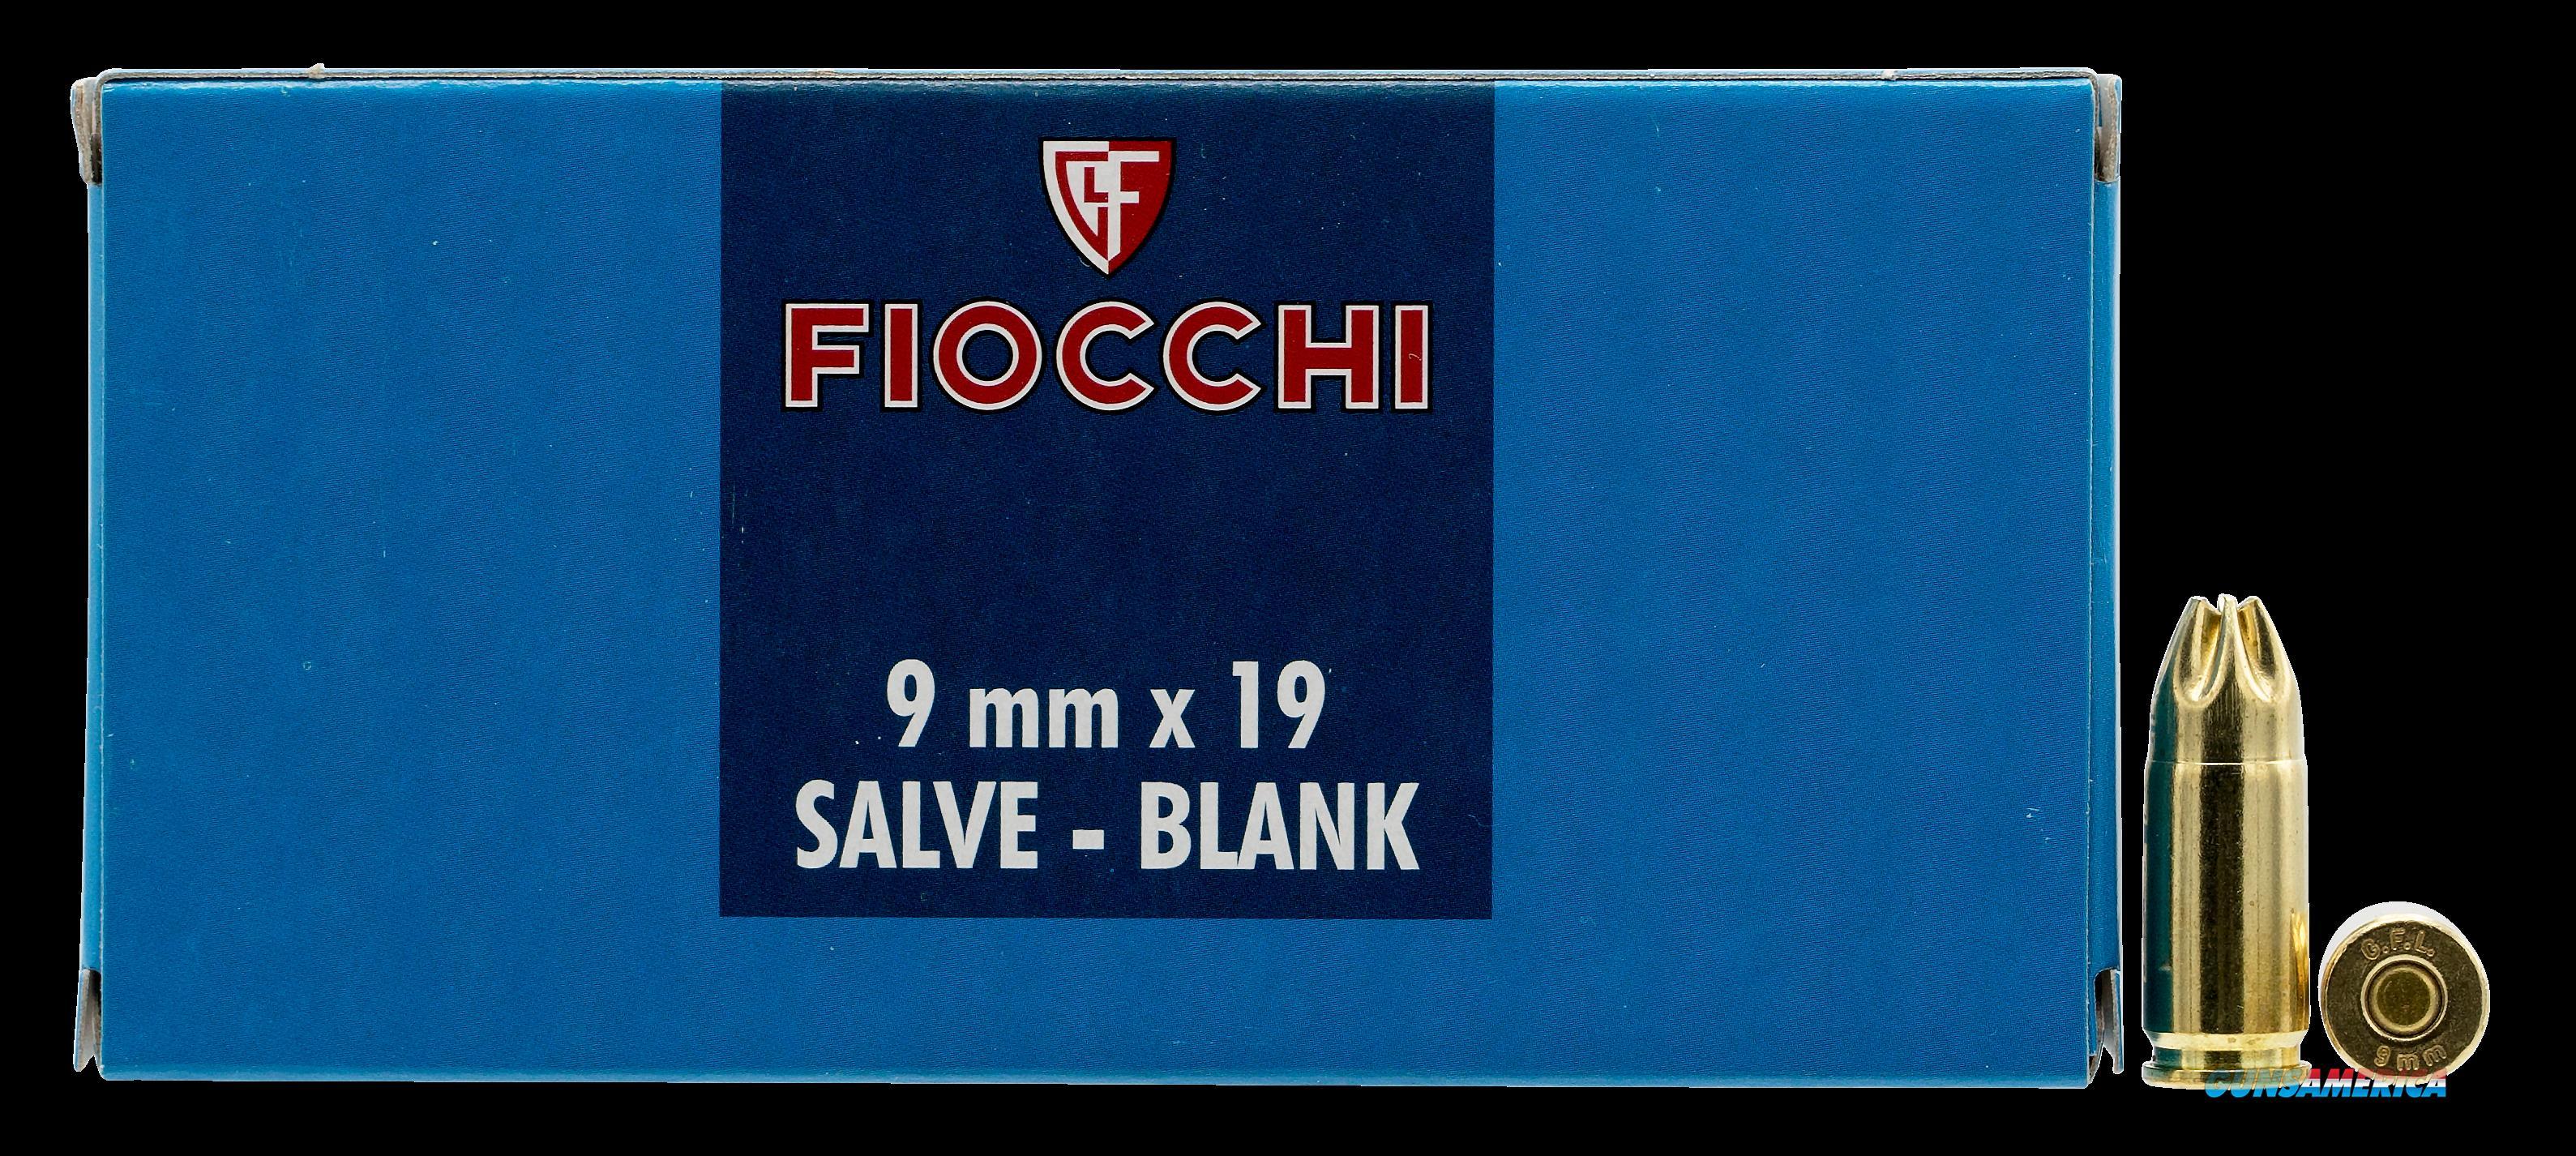 Fiocchi Pistol, Fio 9mmblank  9mm Blank             50-20  Guns > Pistols > 1911 Pistol Copies (non-Colt)